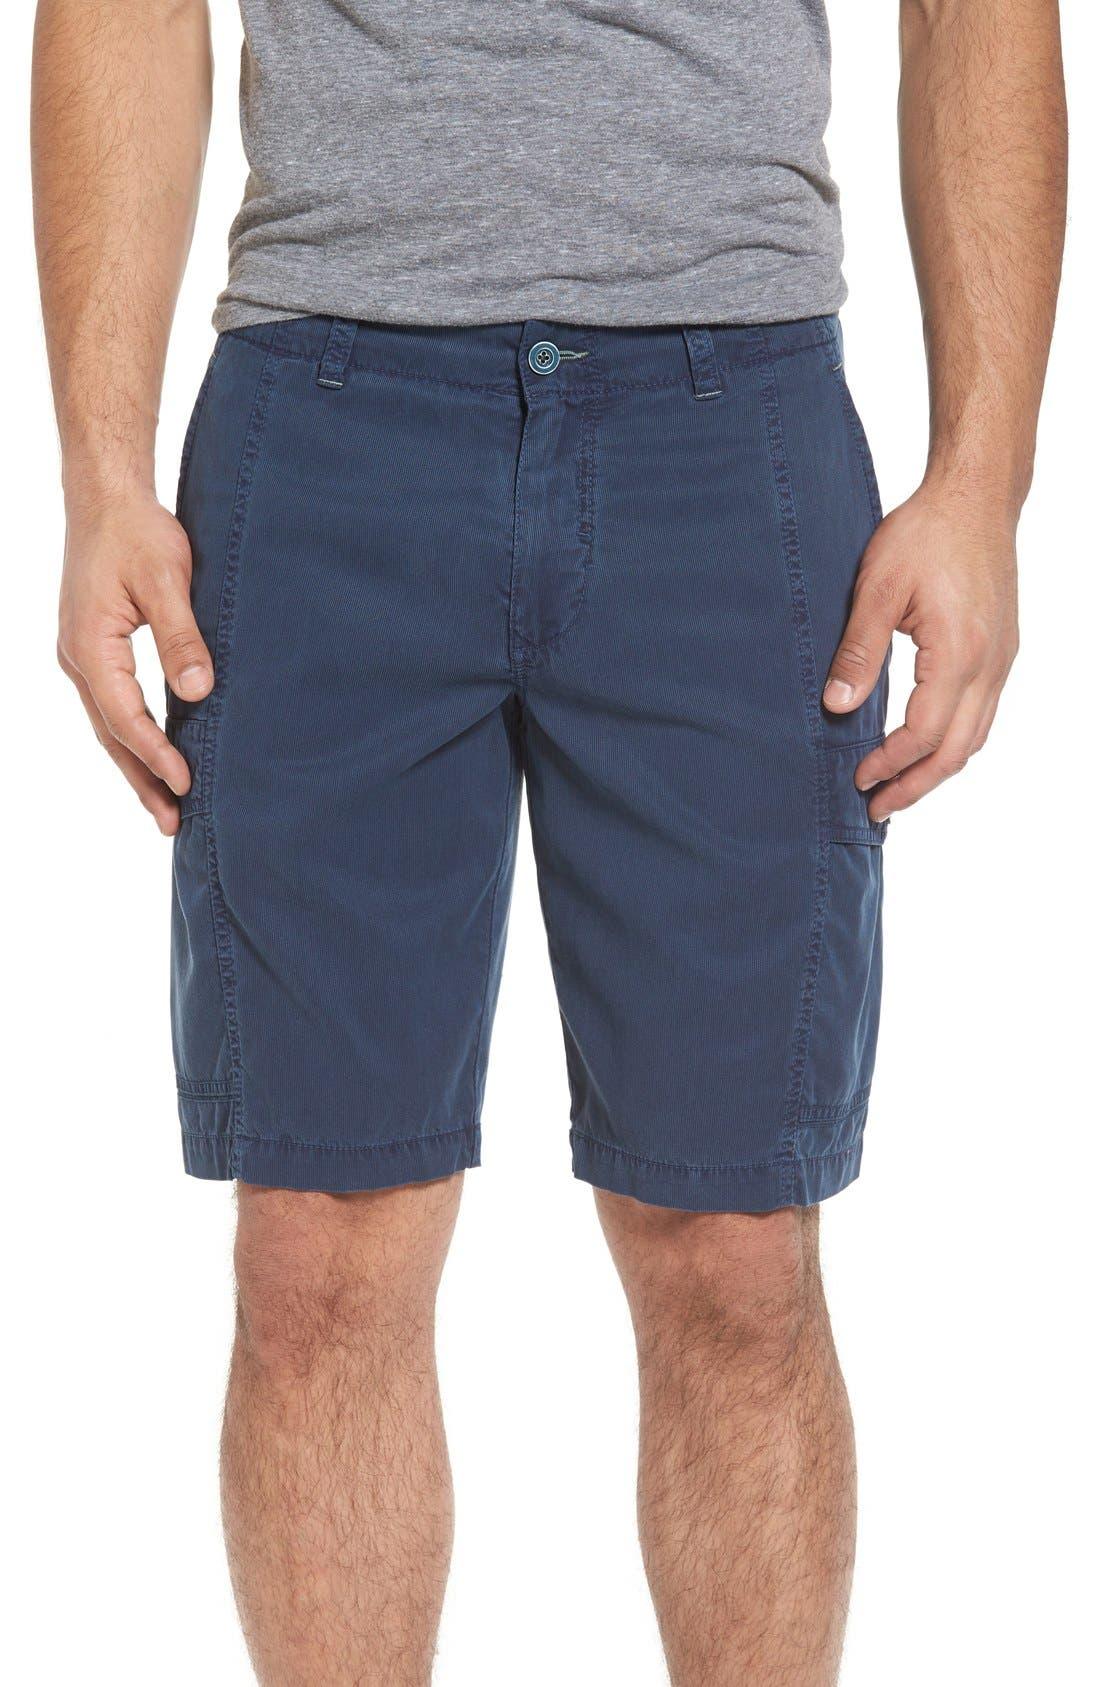 'Beachfront Kihei' Cargo Shorts,                             Main thumbnail 1, color,                             Navy